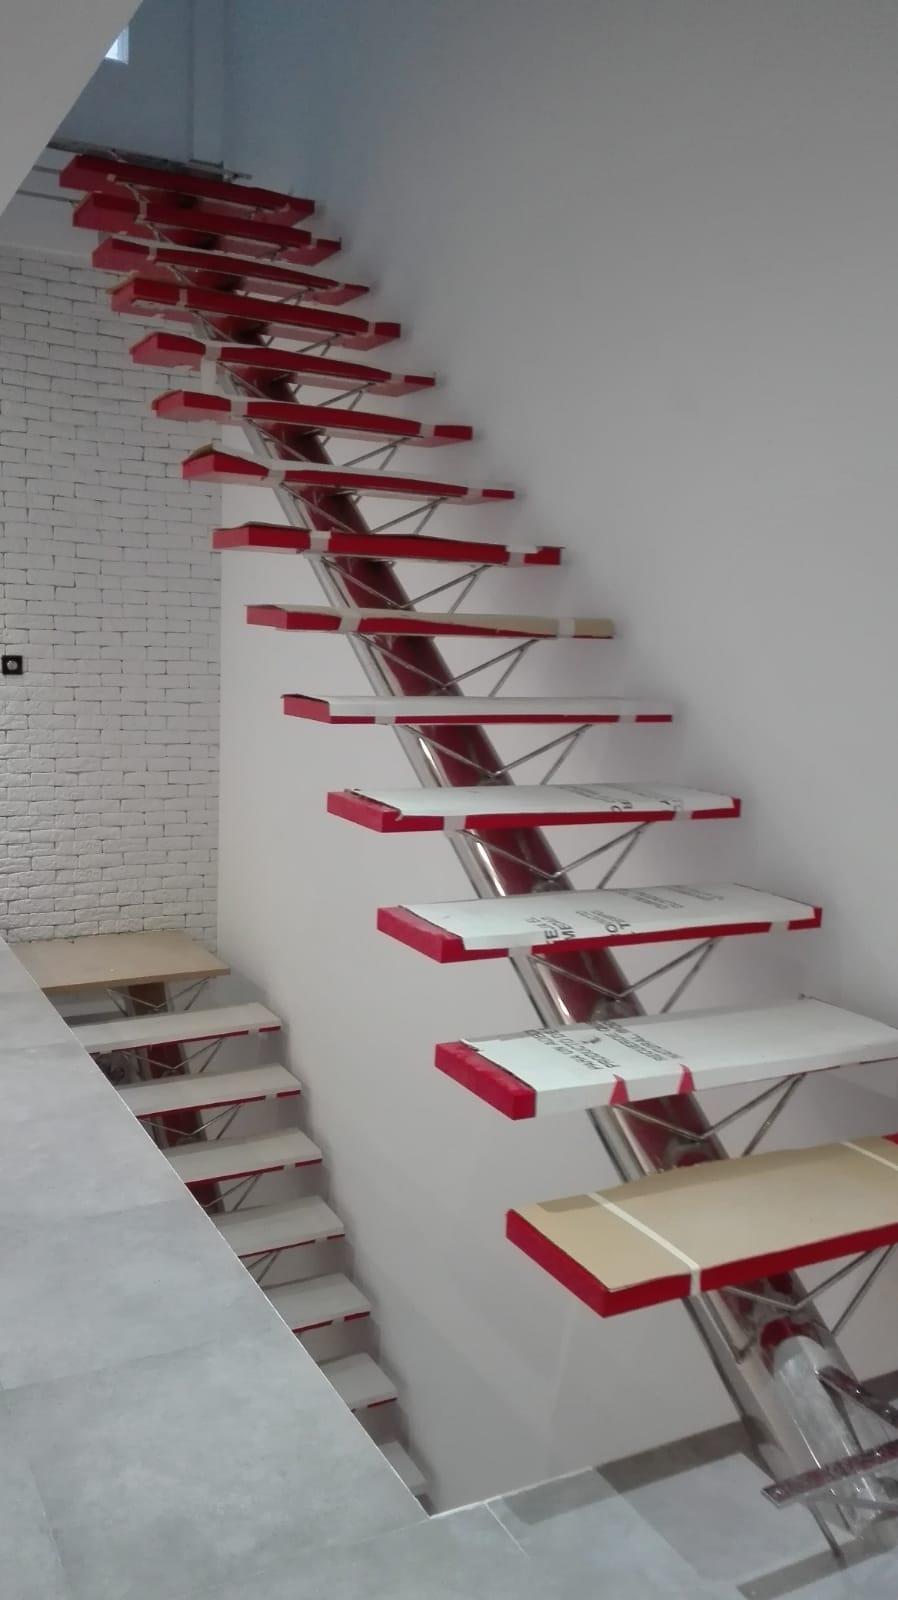 Escaleras rojo Ferrari